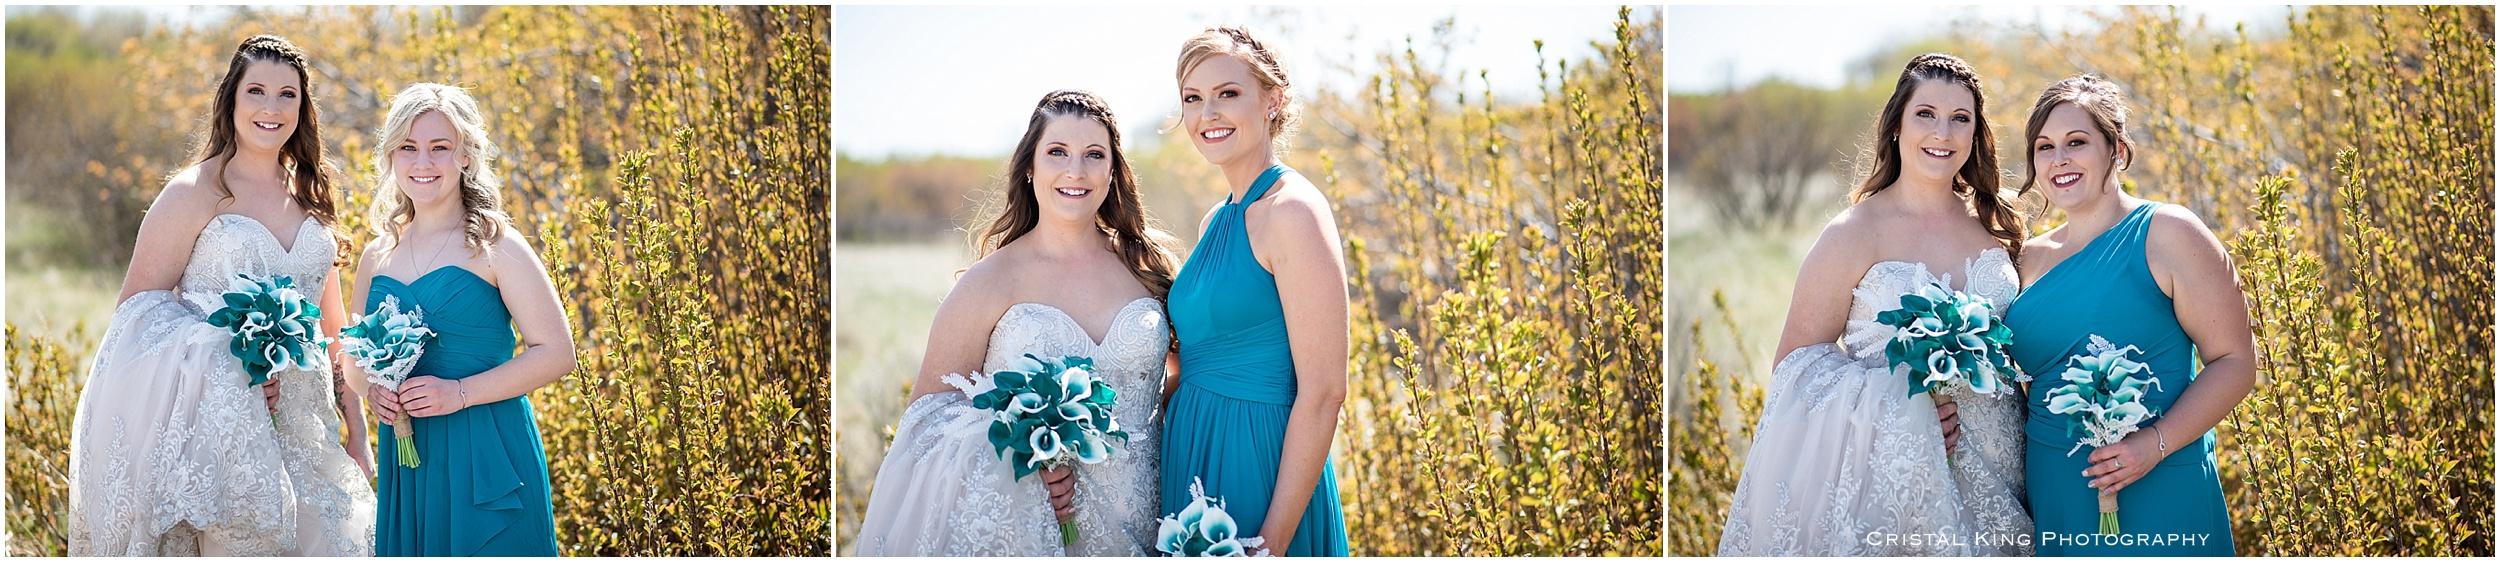 Myla & Grant Wedding-98.jpg